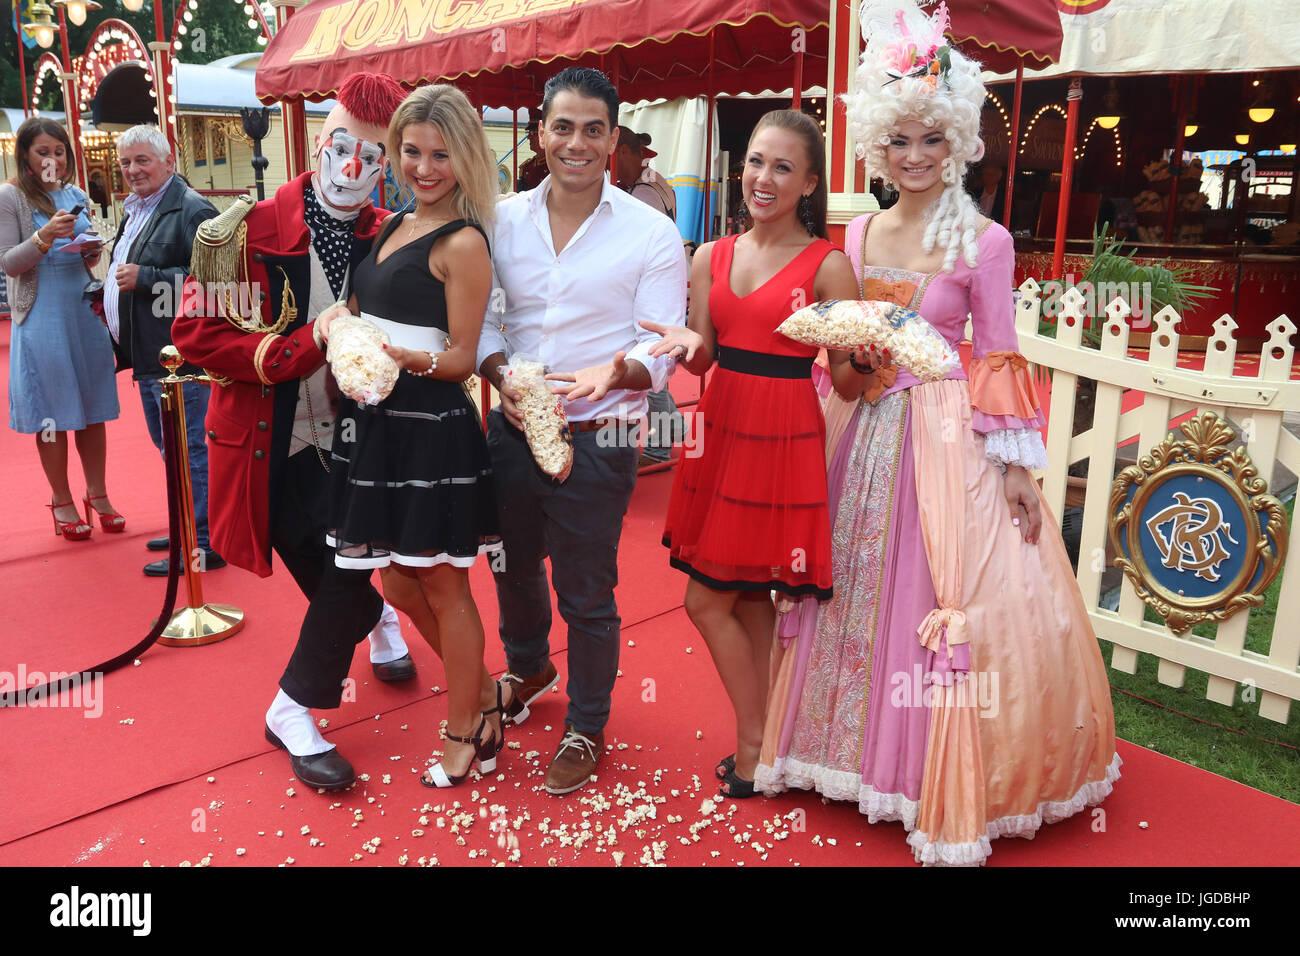 Roncalli Circus Premiere in Hamburg  Featuring: Hot Banditoz, Danika Wist, Silva Gonzalez, Stefanie Schanzleh Where: - Stock Image